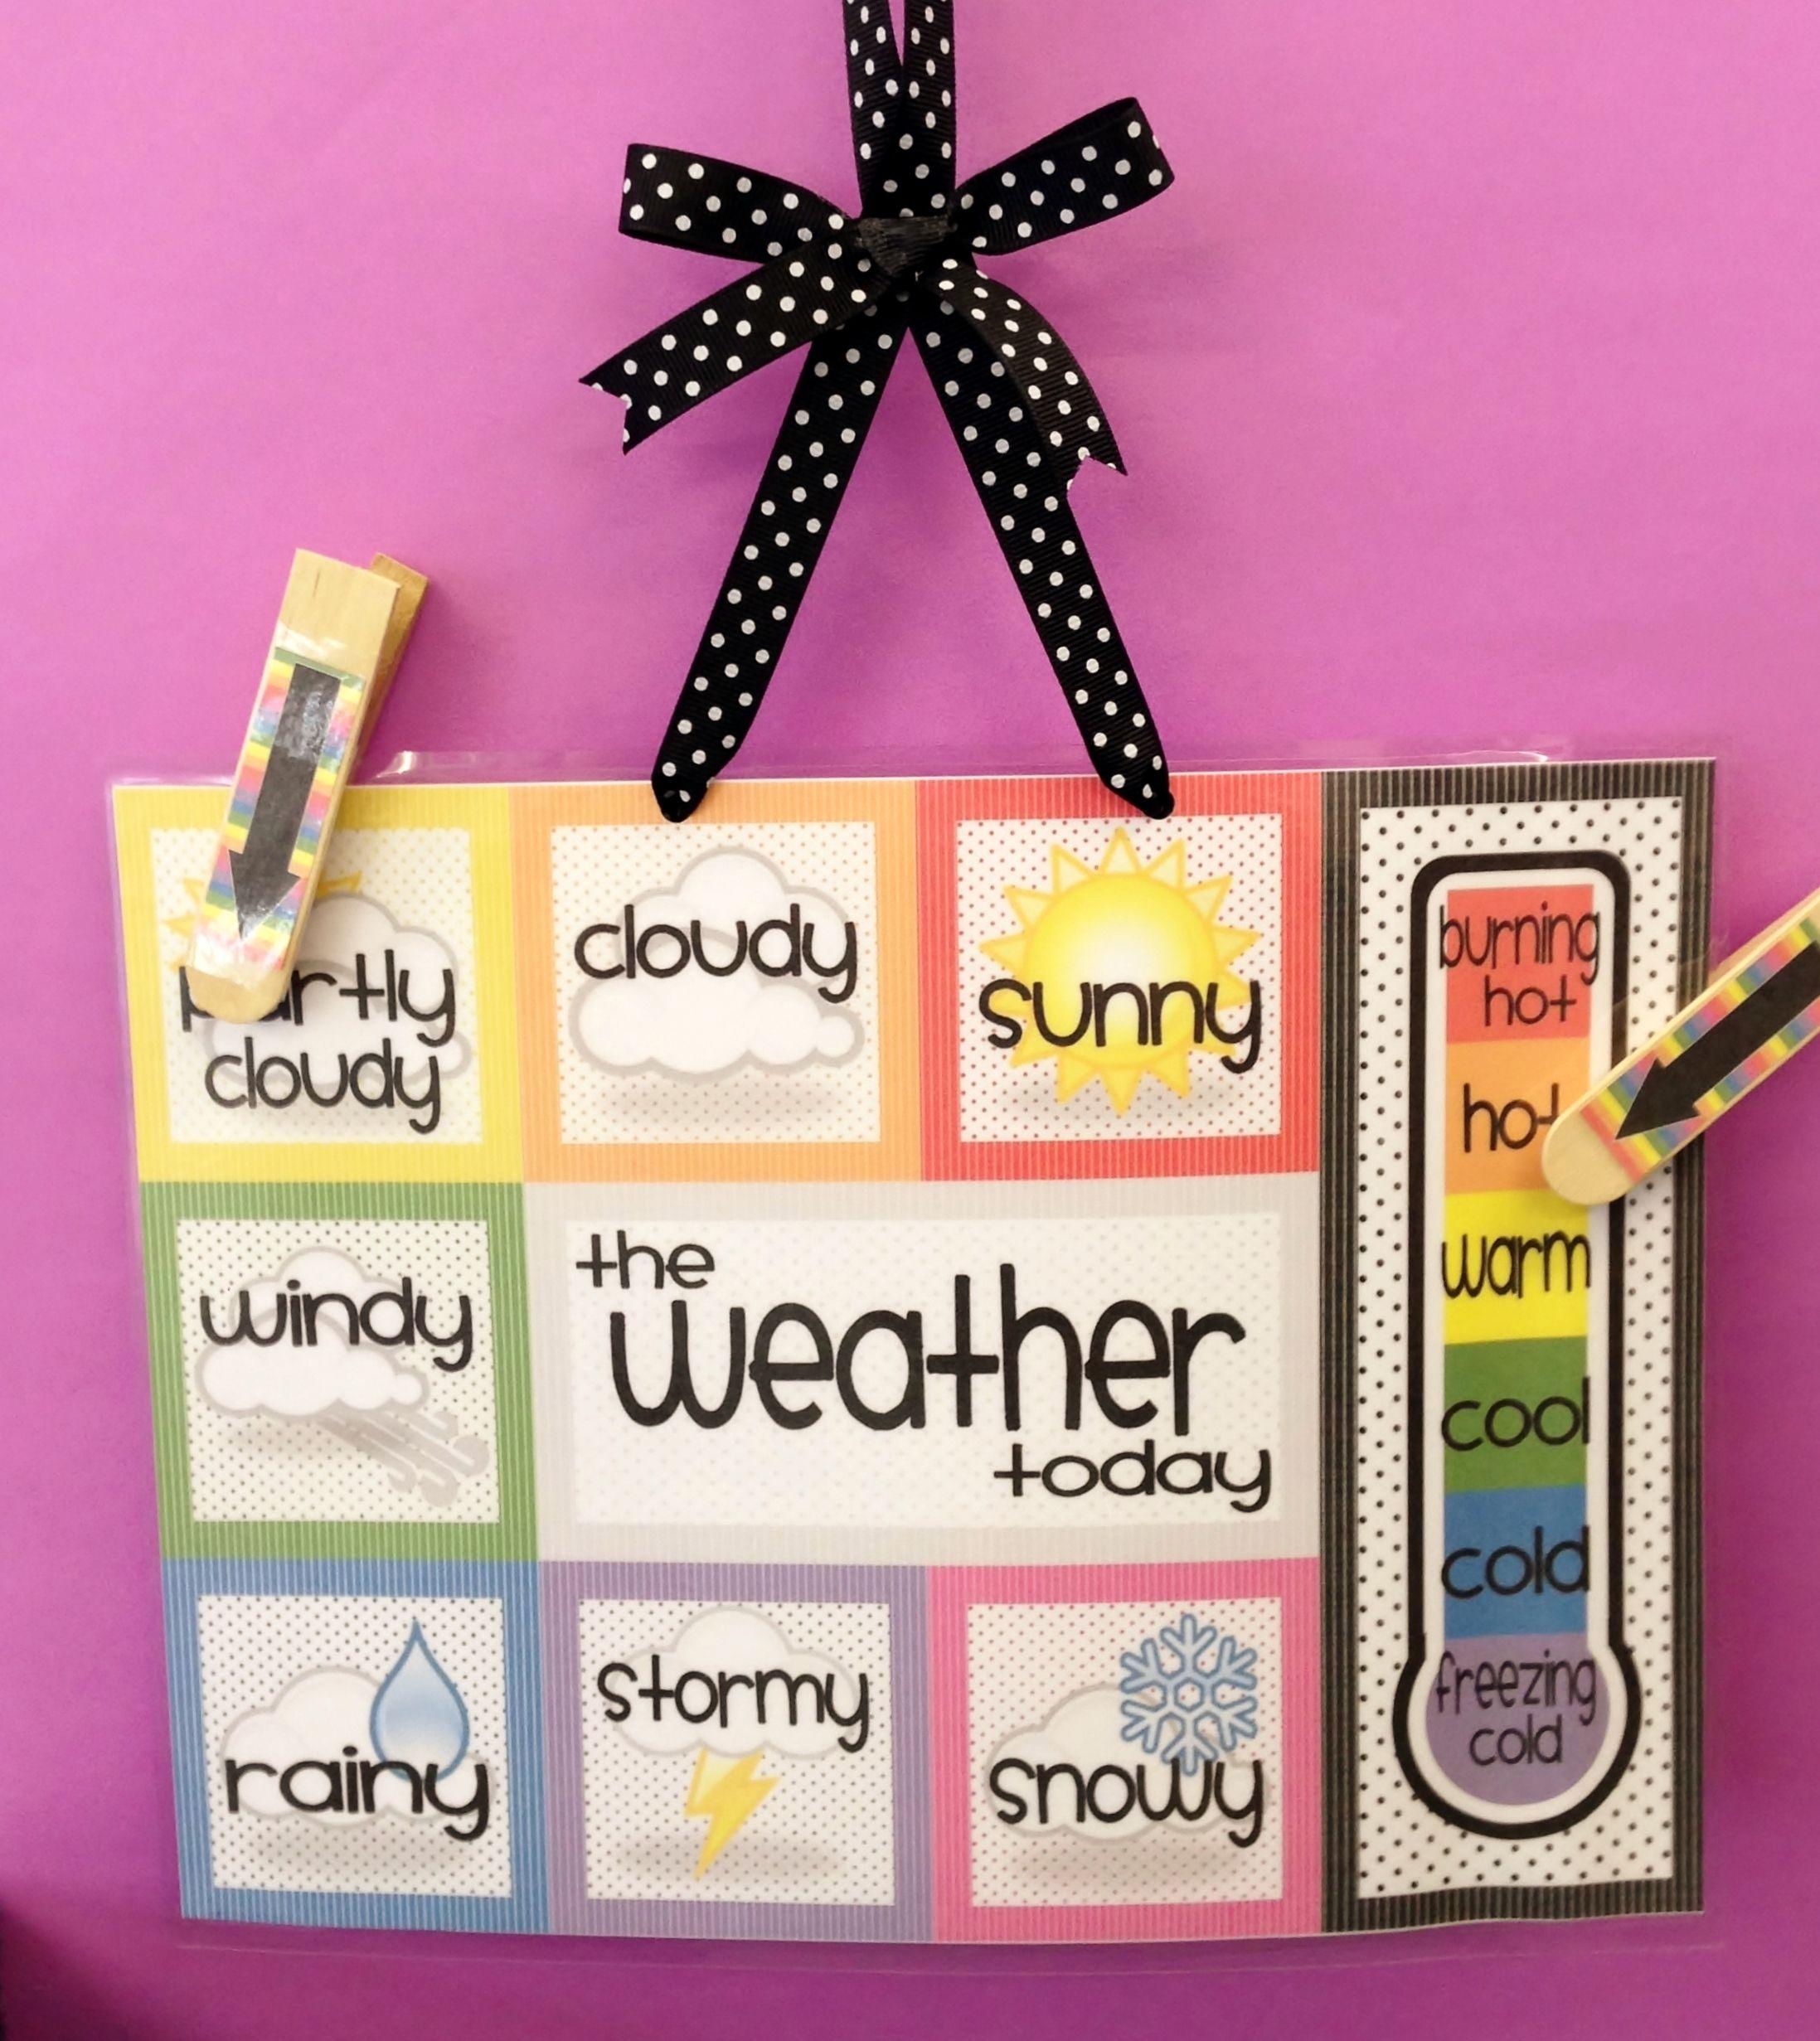 Weather Boards with Clothes Pegs - https://docs.google.com/file/d/0B9UlJnYD3dZGcktNVVYwZzZtYlU/edit?pli=1